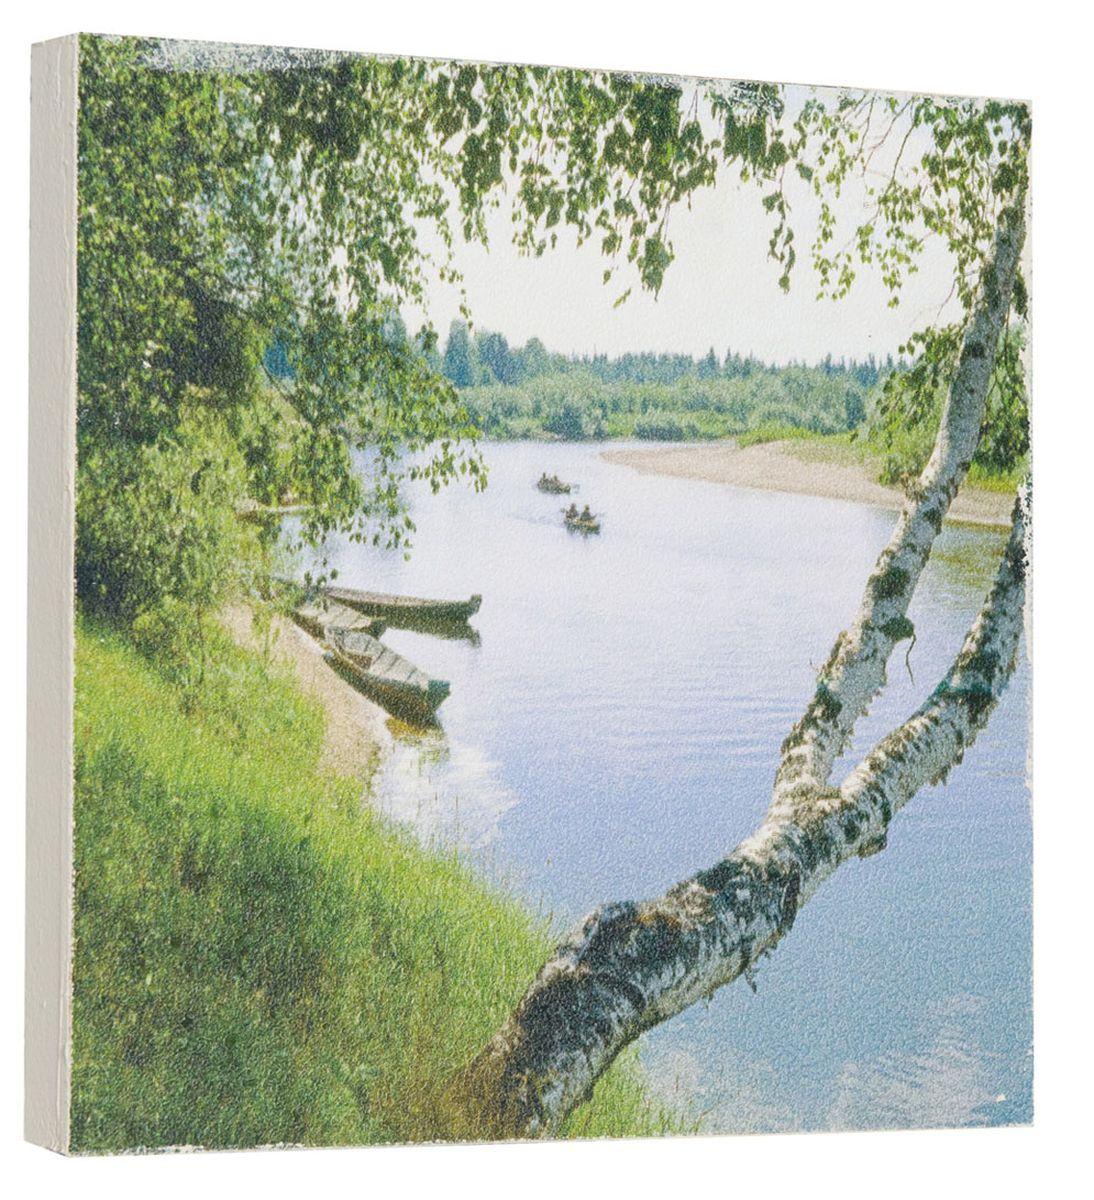 Картина Красивые березки у реки, 22 х 22 см0286-22-22